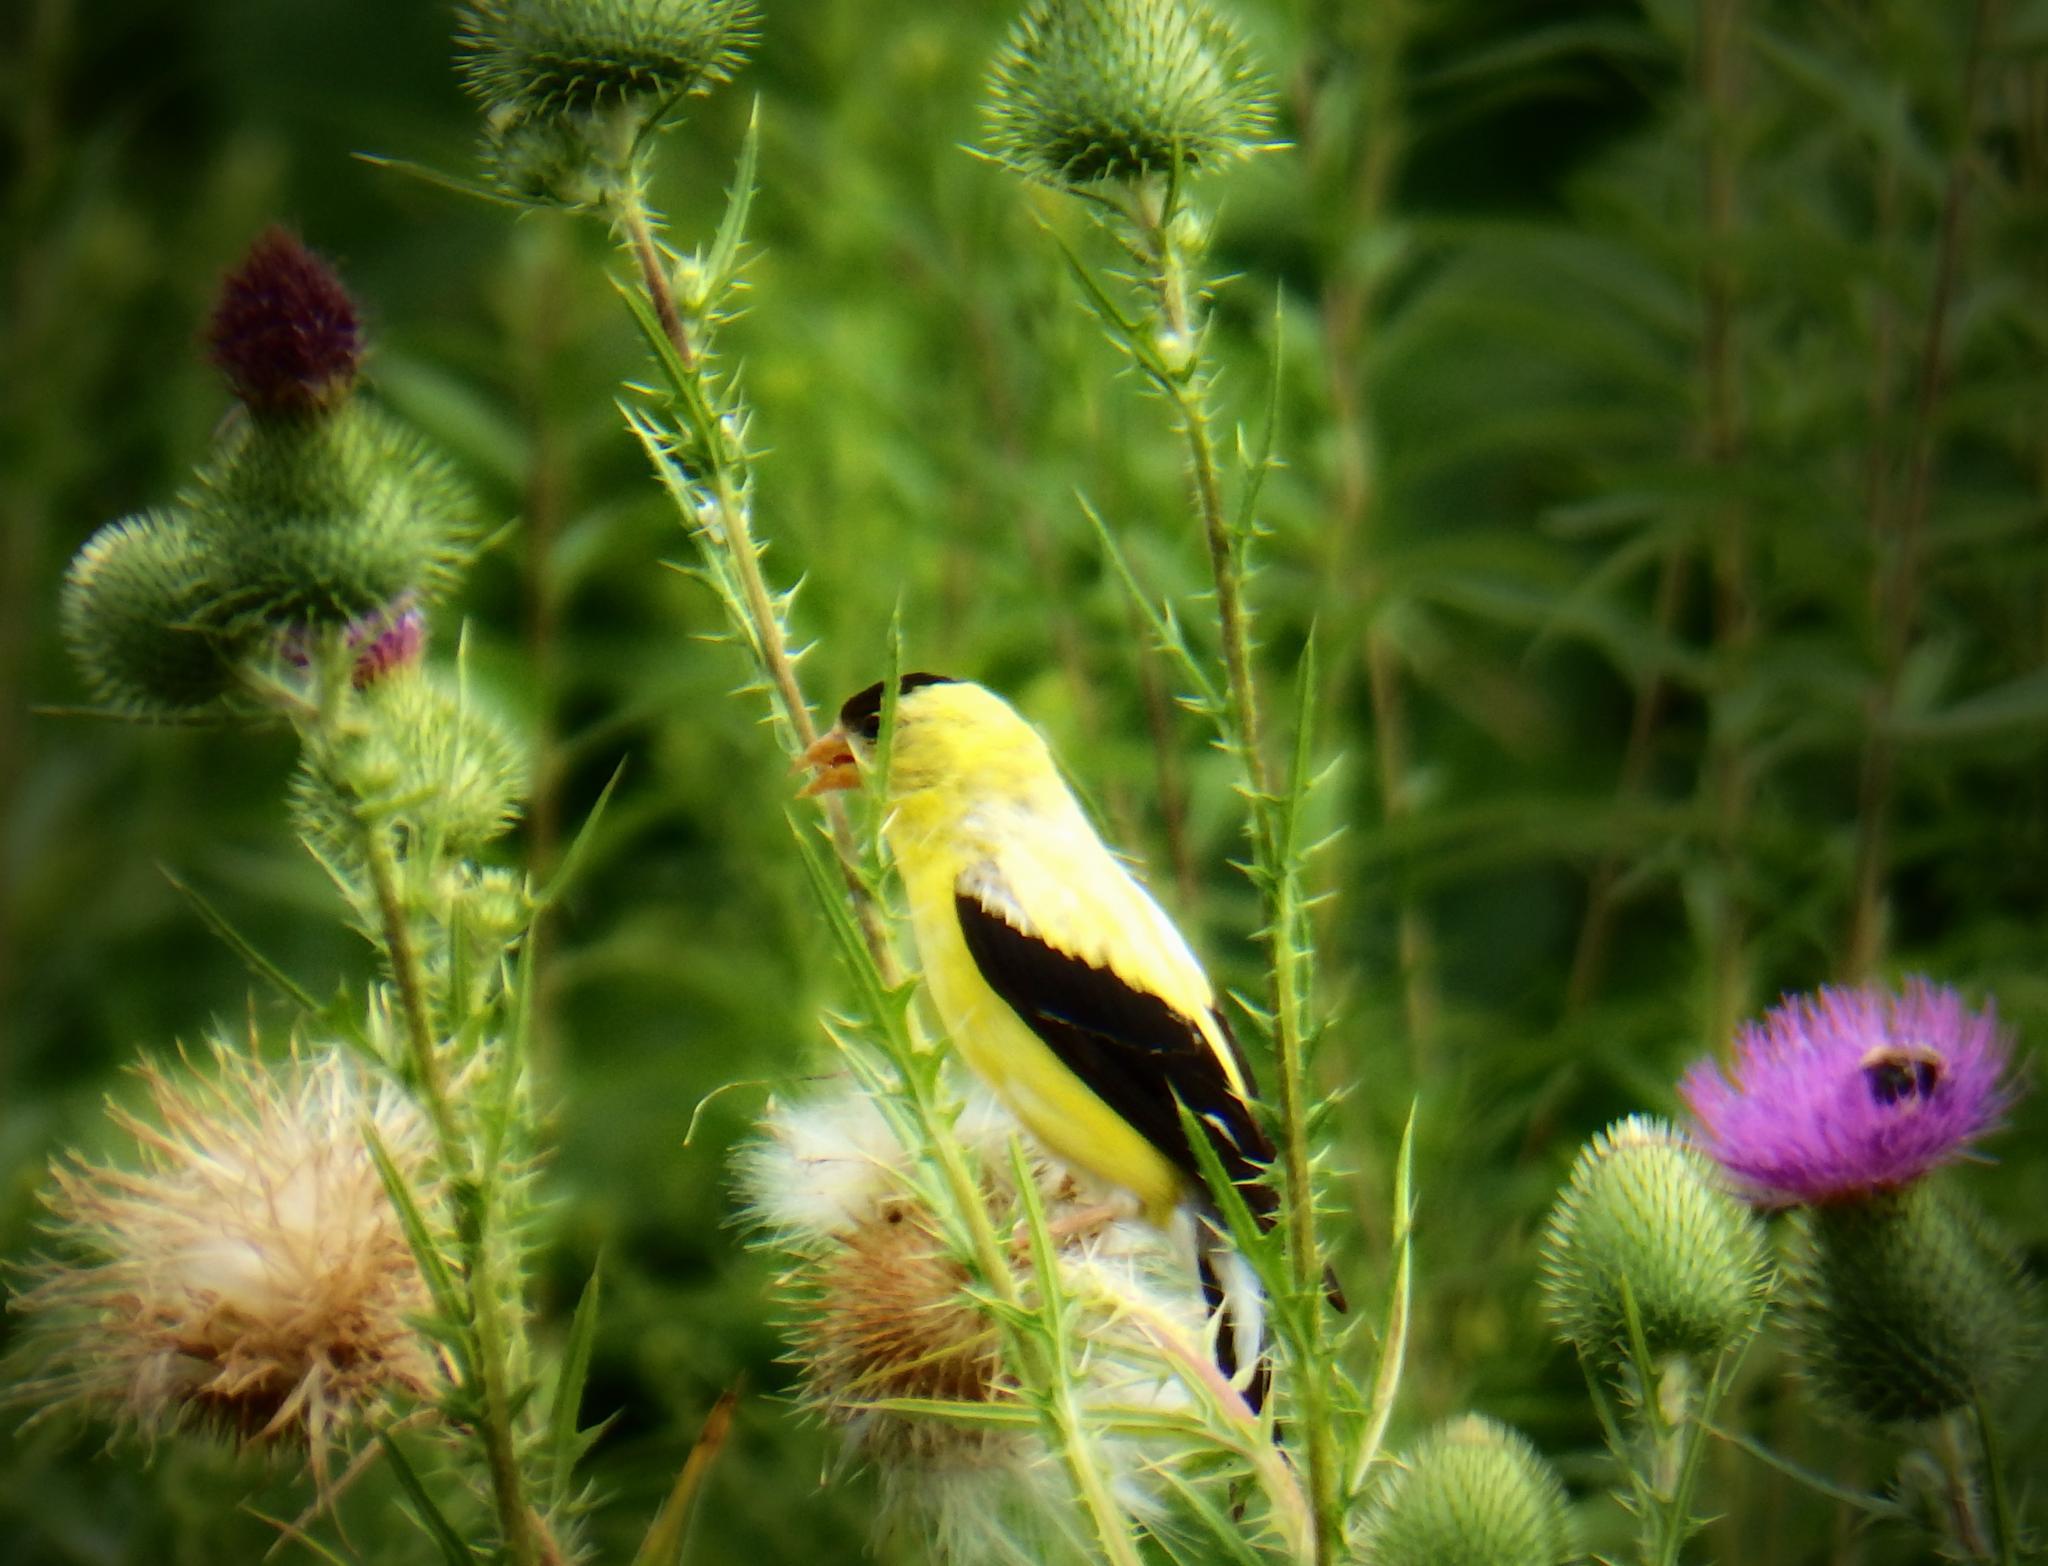 Gold Finch by Darlene Eastin